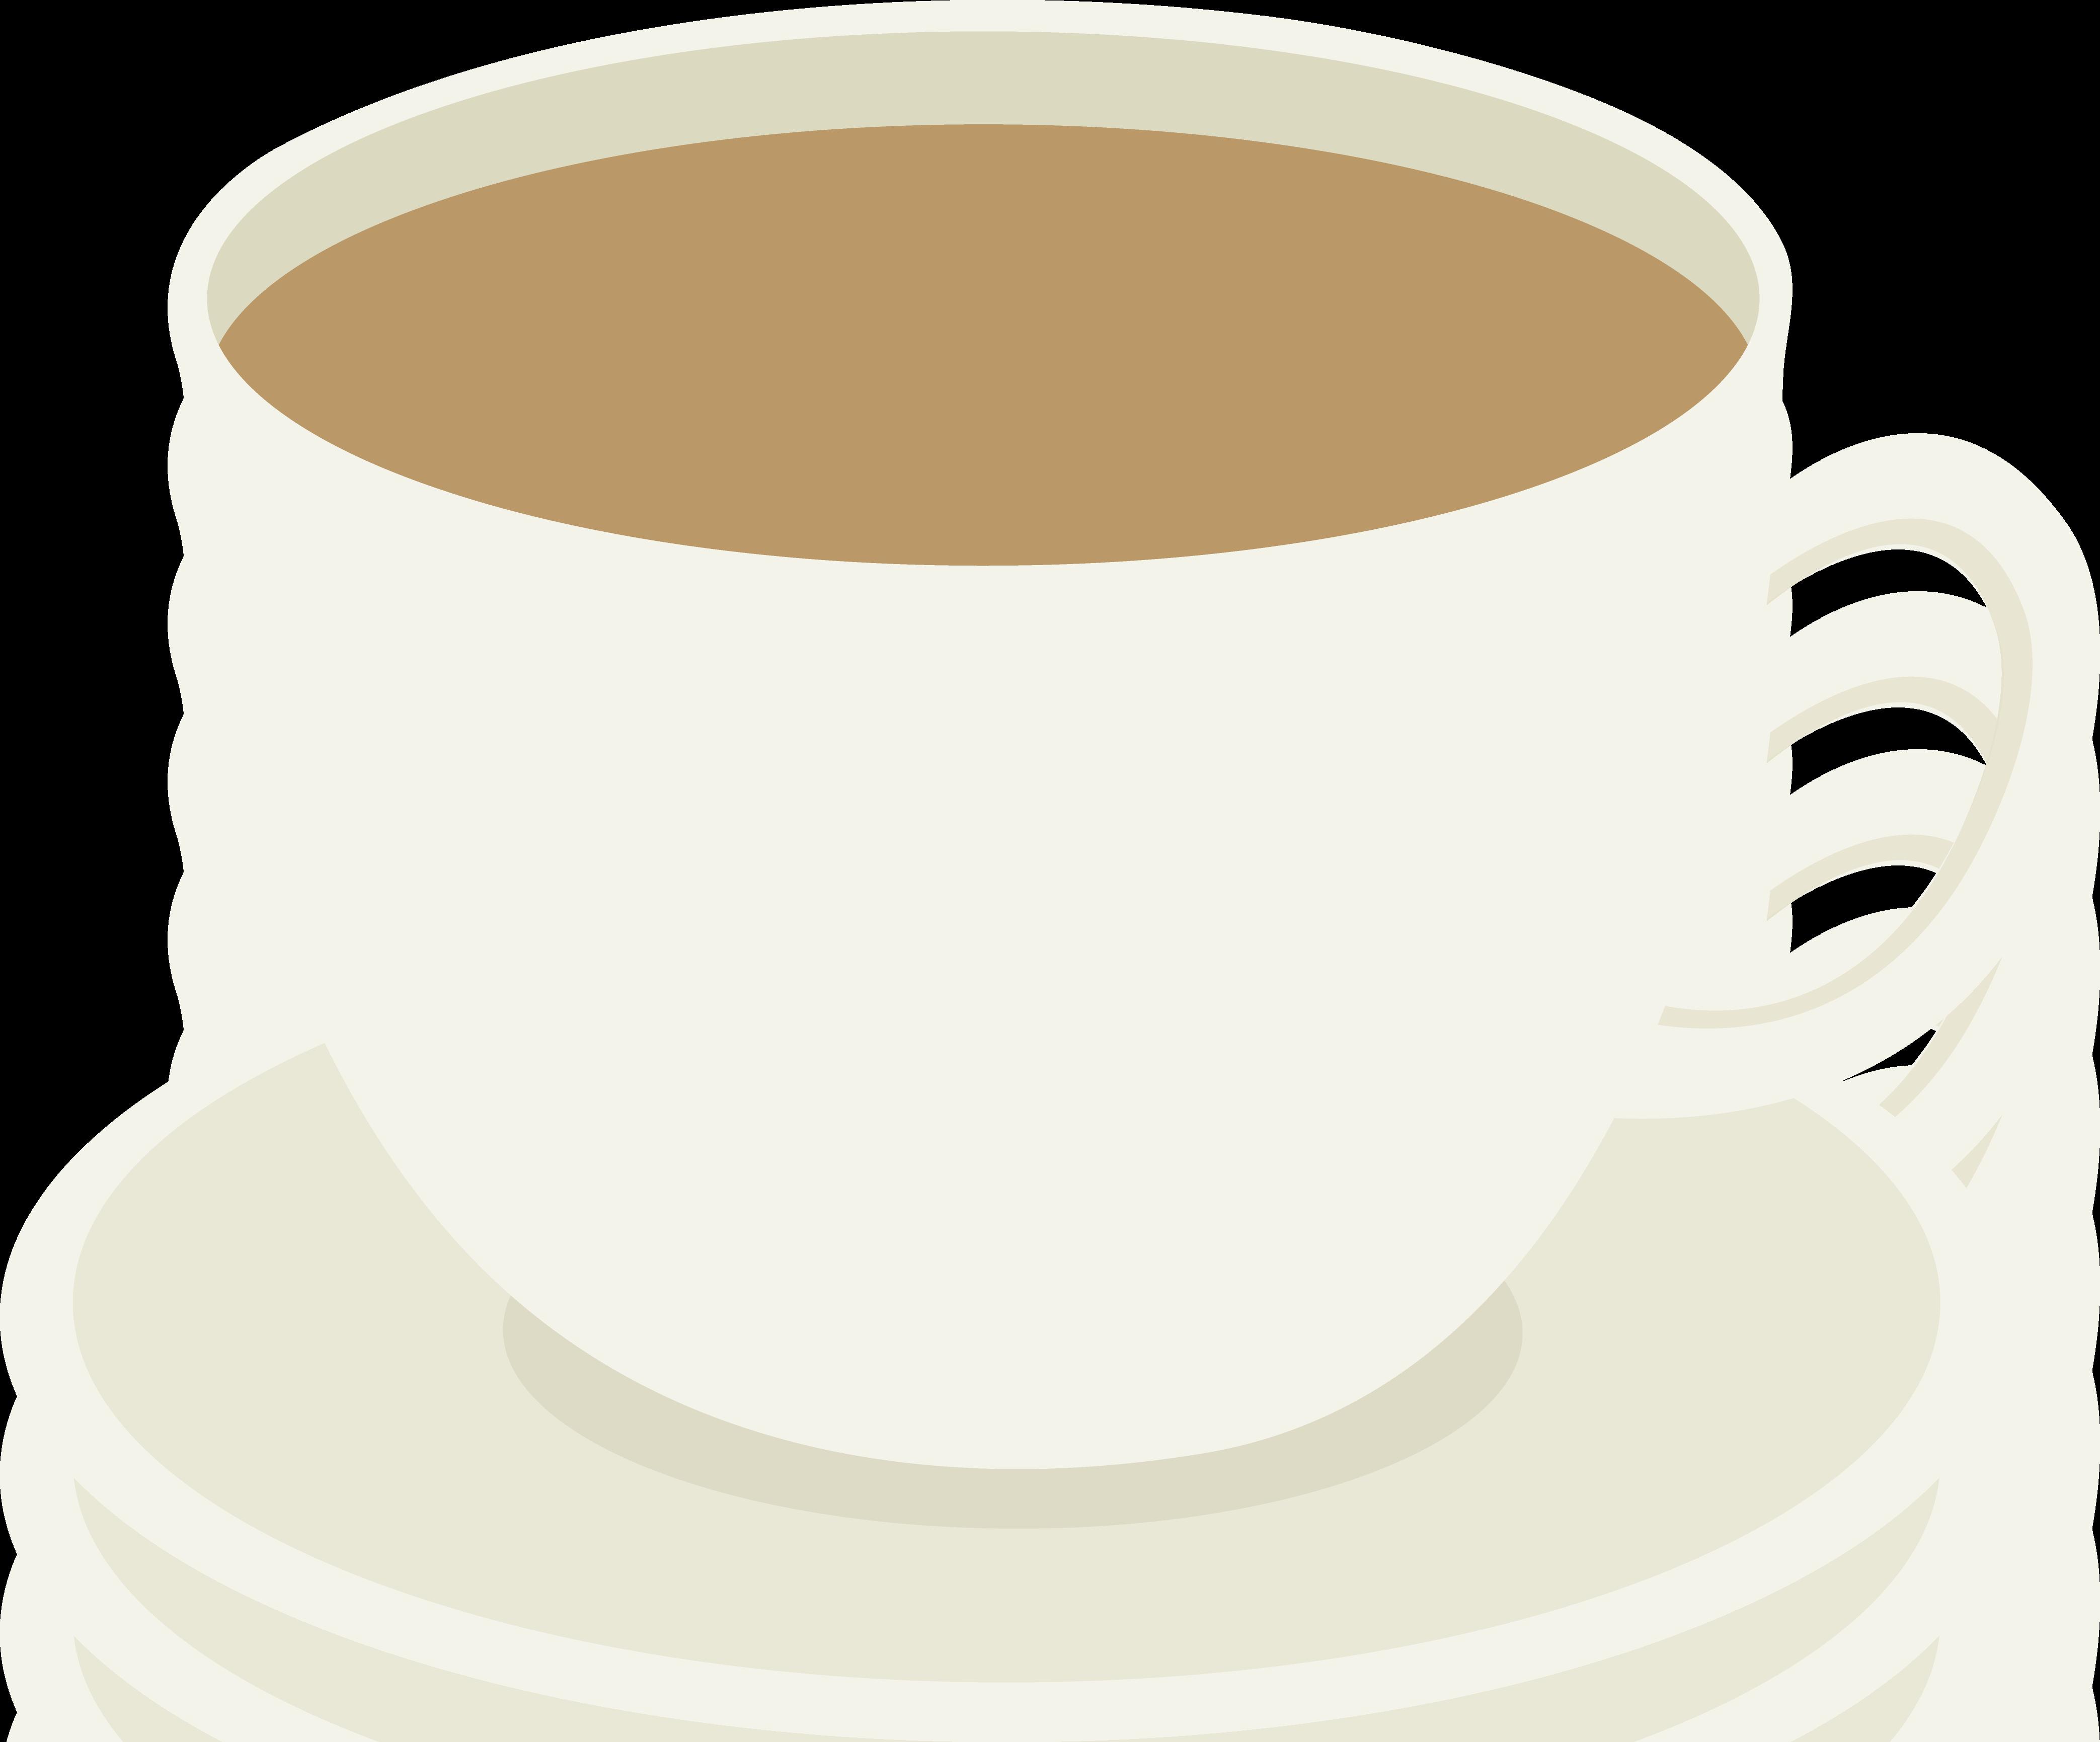 Mug hot coffee pencil. Clipart cup bath